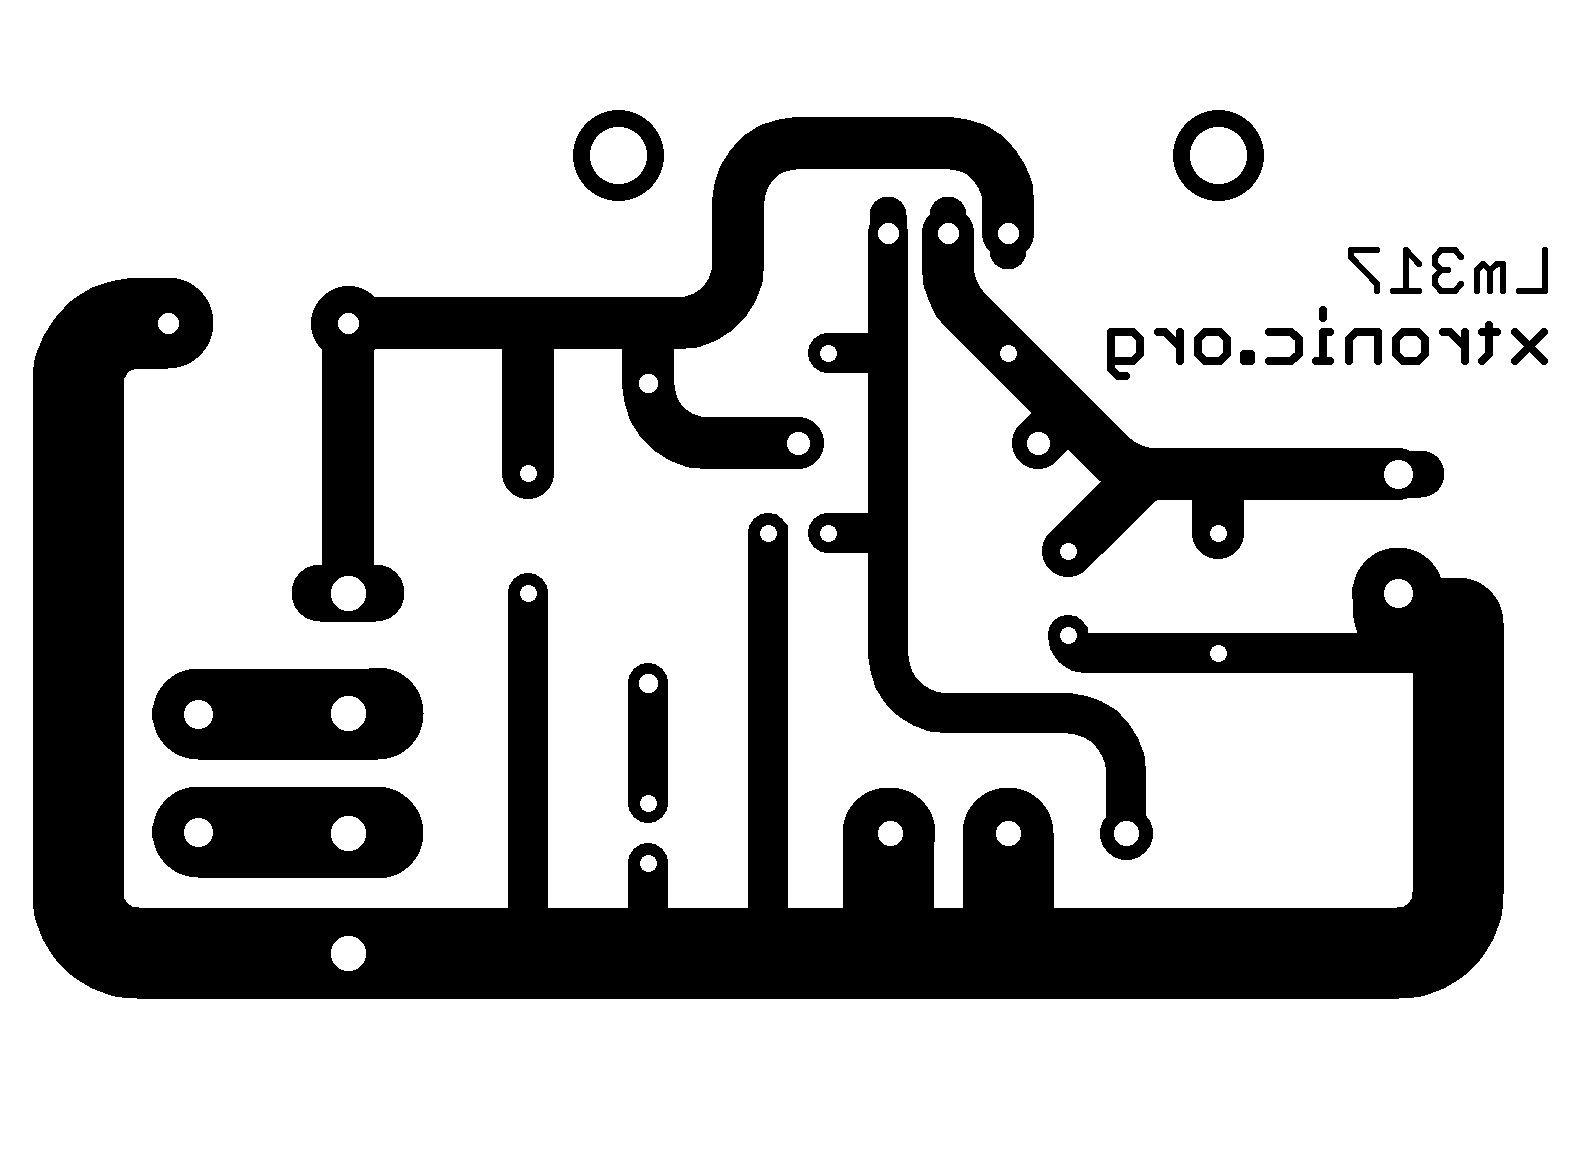 Lm317 Pcb Circuit